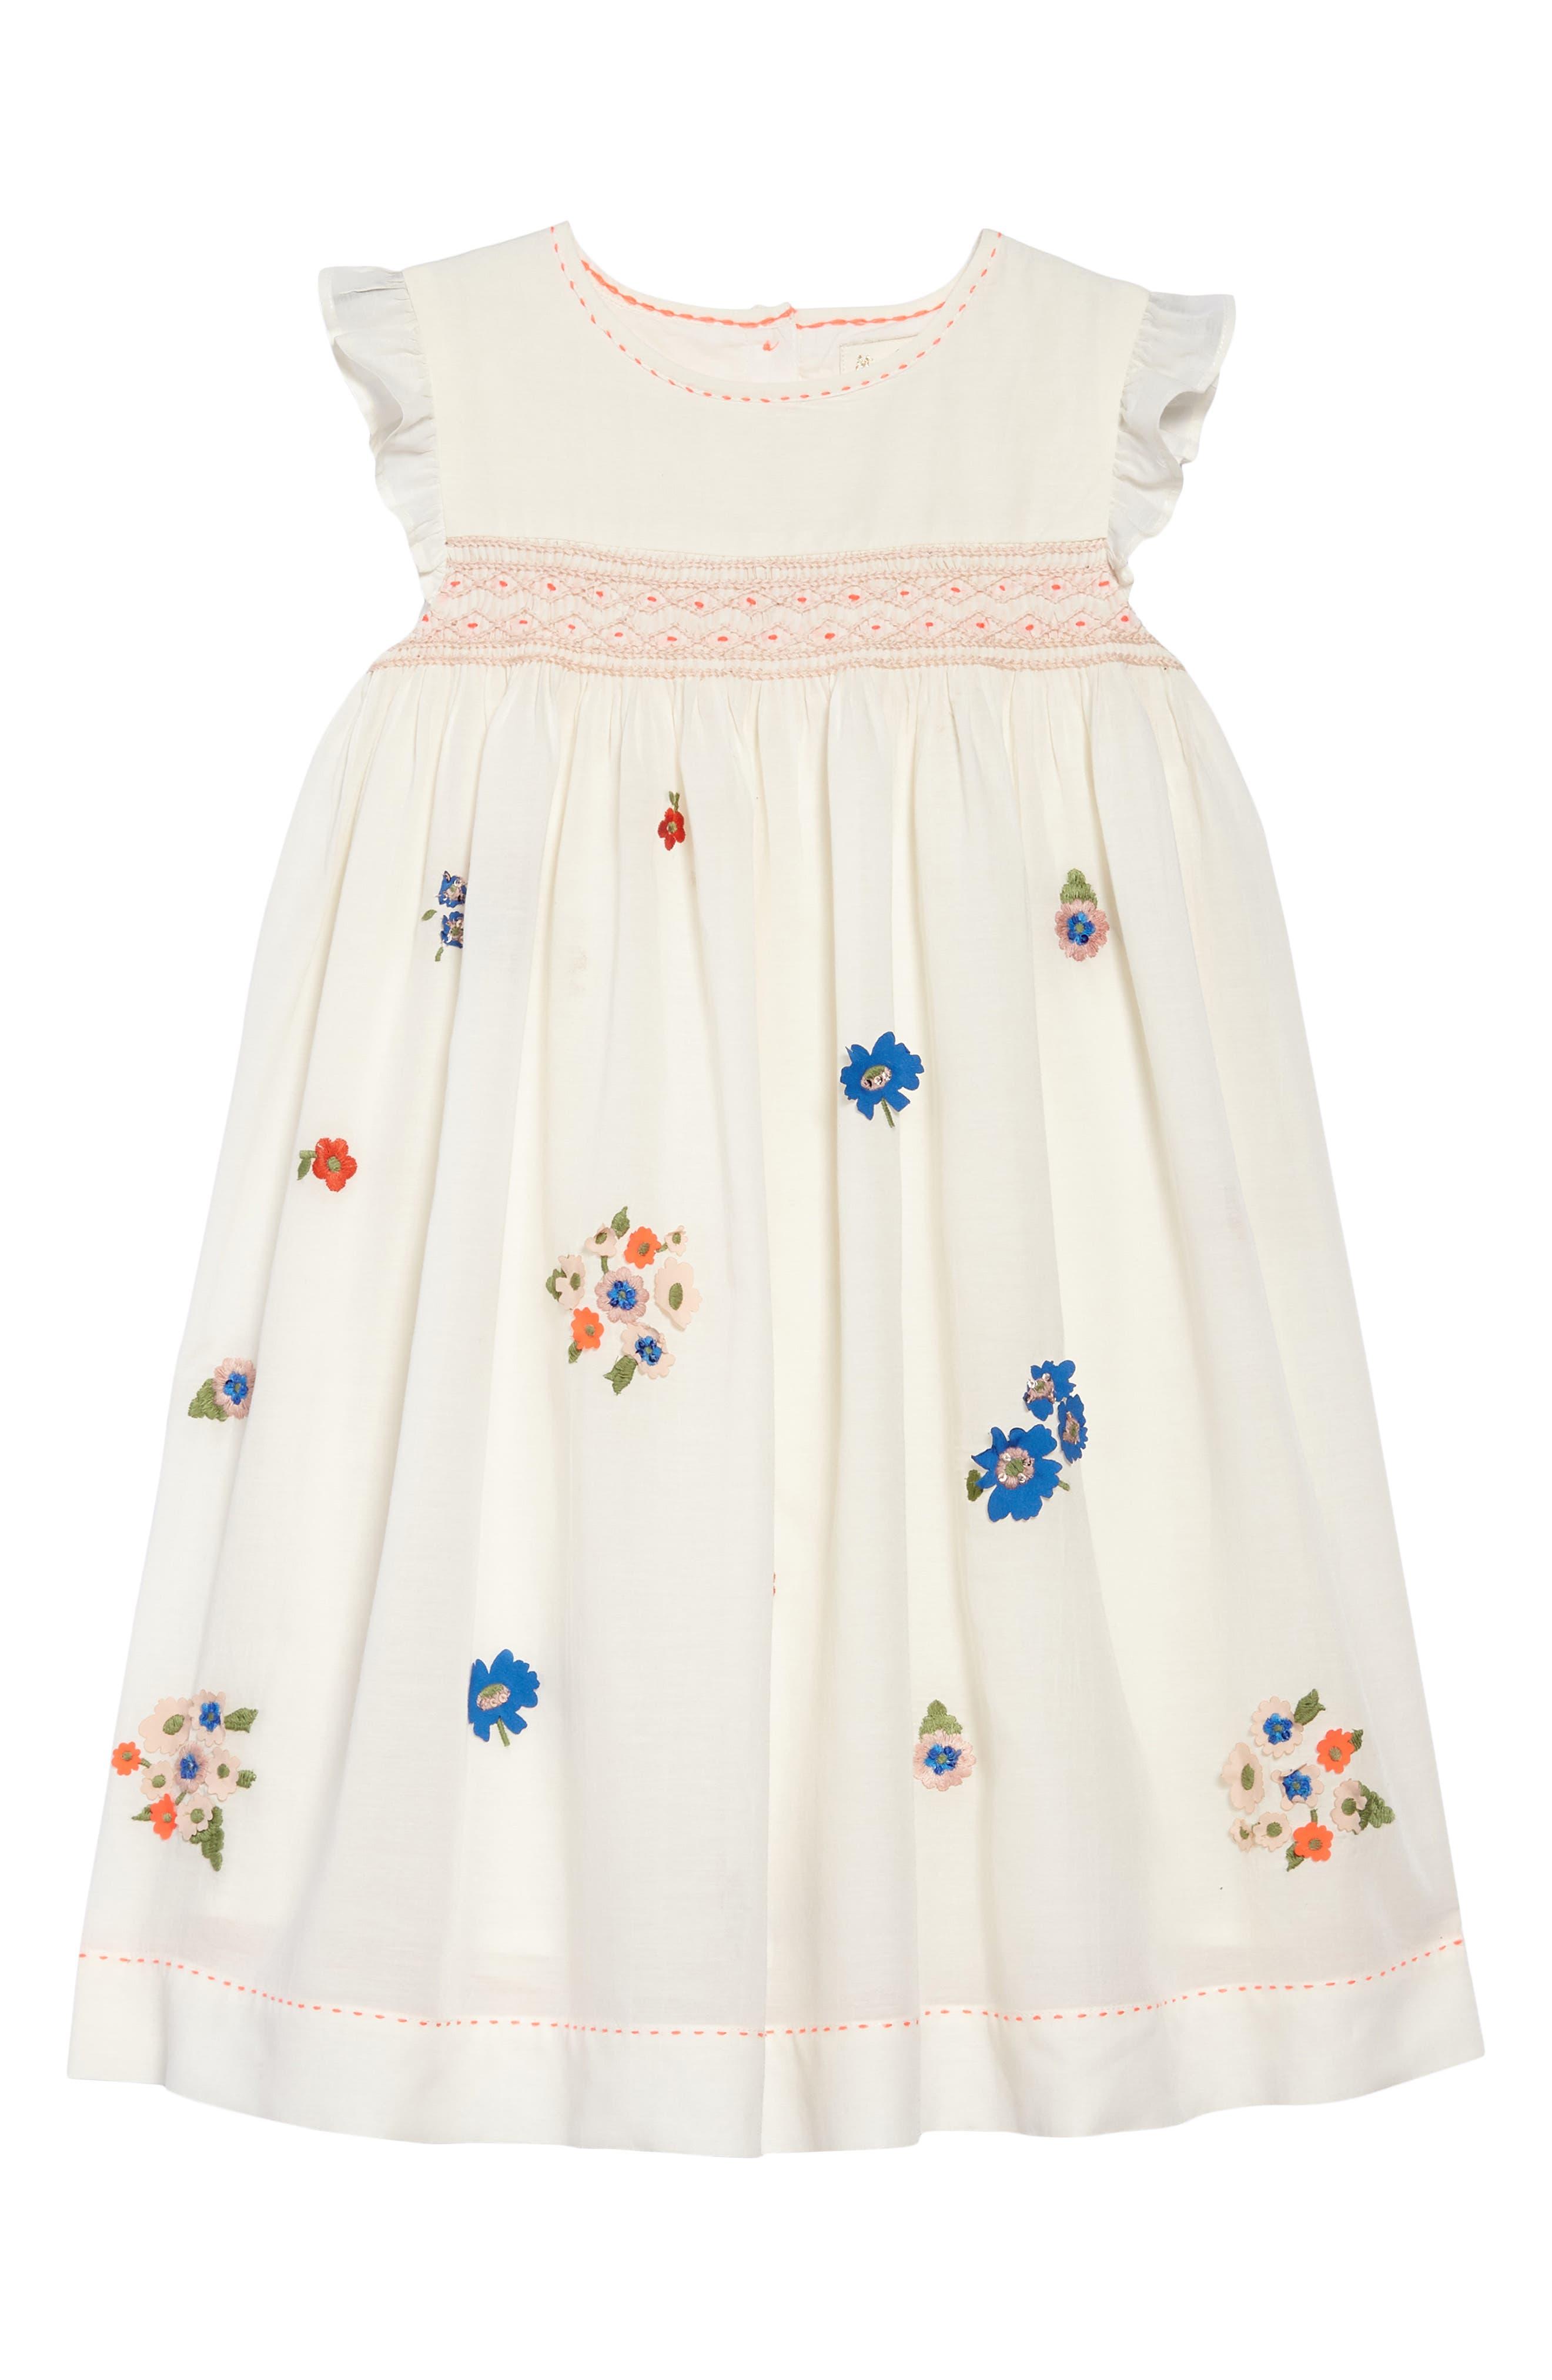 Embroidered Smock Dress,                             Main thumbnail 1, color,                             902